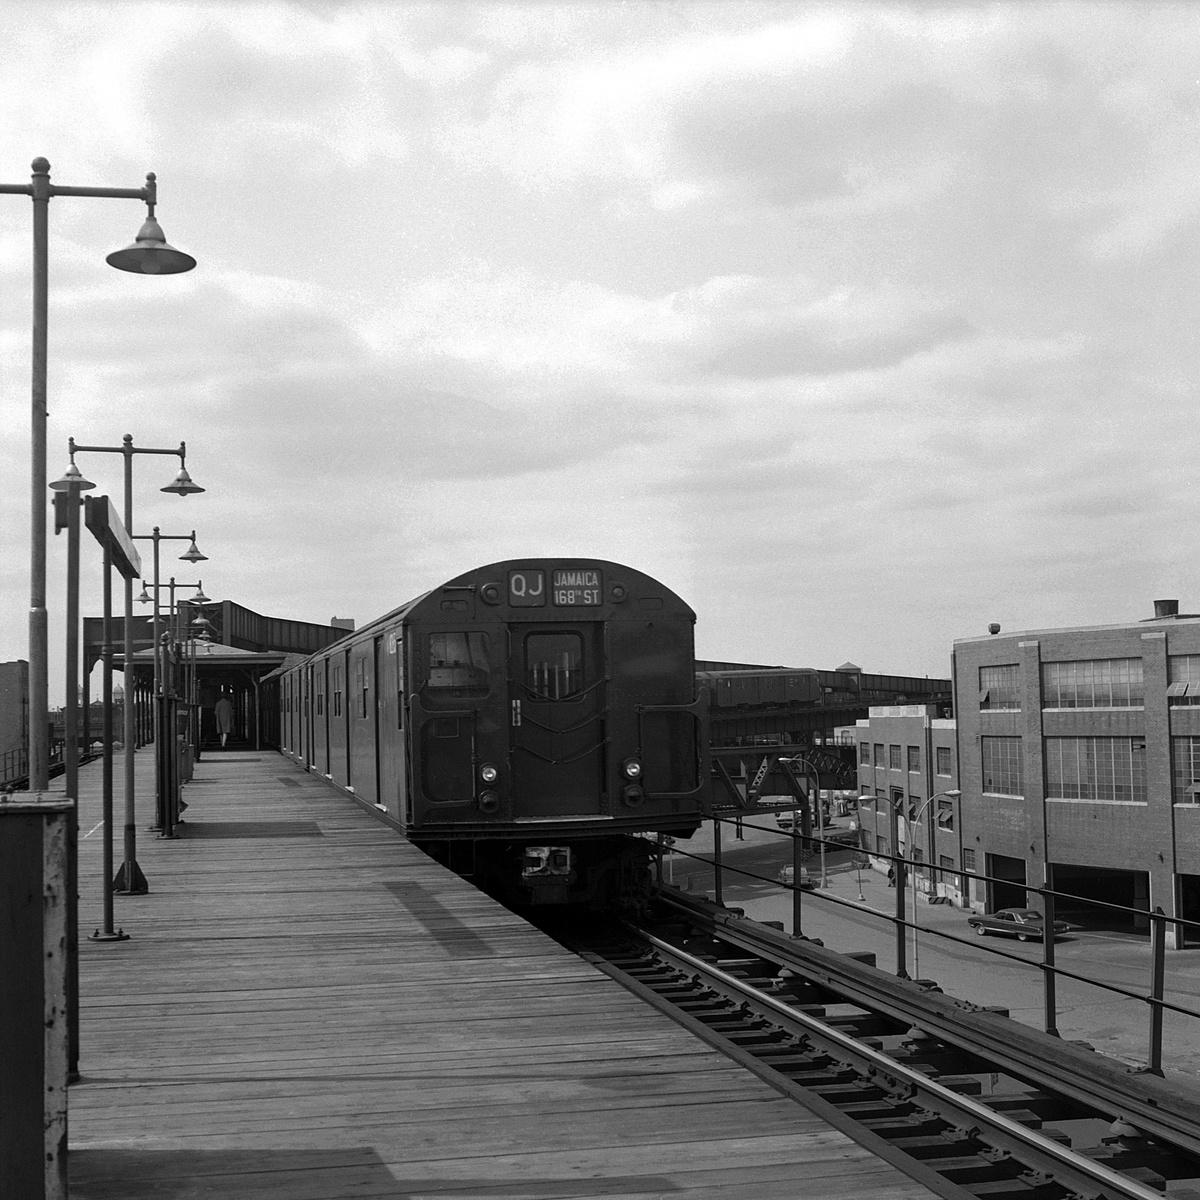 (506k, 1200x1200)<br><b>Country:</b> United States<br><b>City:</b> New York<br><b>System:</b> New York City Transit<br><b>Line:</b> BMT Nassau Street-Jamaica Line<br><b>Location:</b> Alabama Avenue<br><b>Route:</b> QJ<br><b>Car:</b> R-27/R-30 Series (Number Unknown)  <br><b>Collection of:</b> David Pirmann<br><b>Date:</b> 3/22/1969<br><b>Viewed (this week/total):</b> 0 / 279